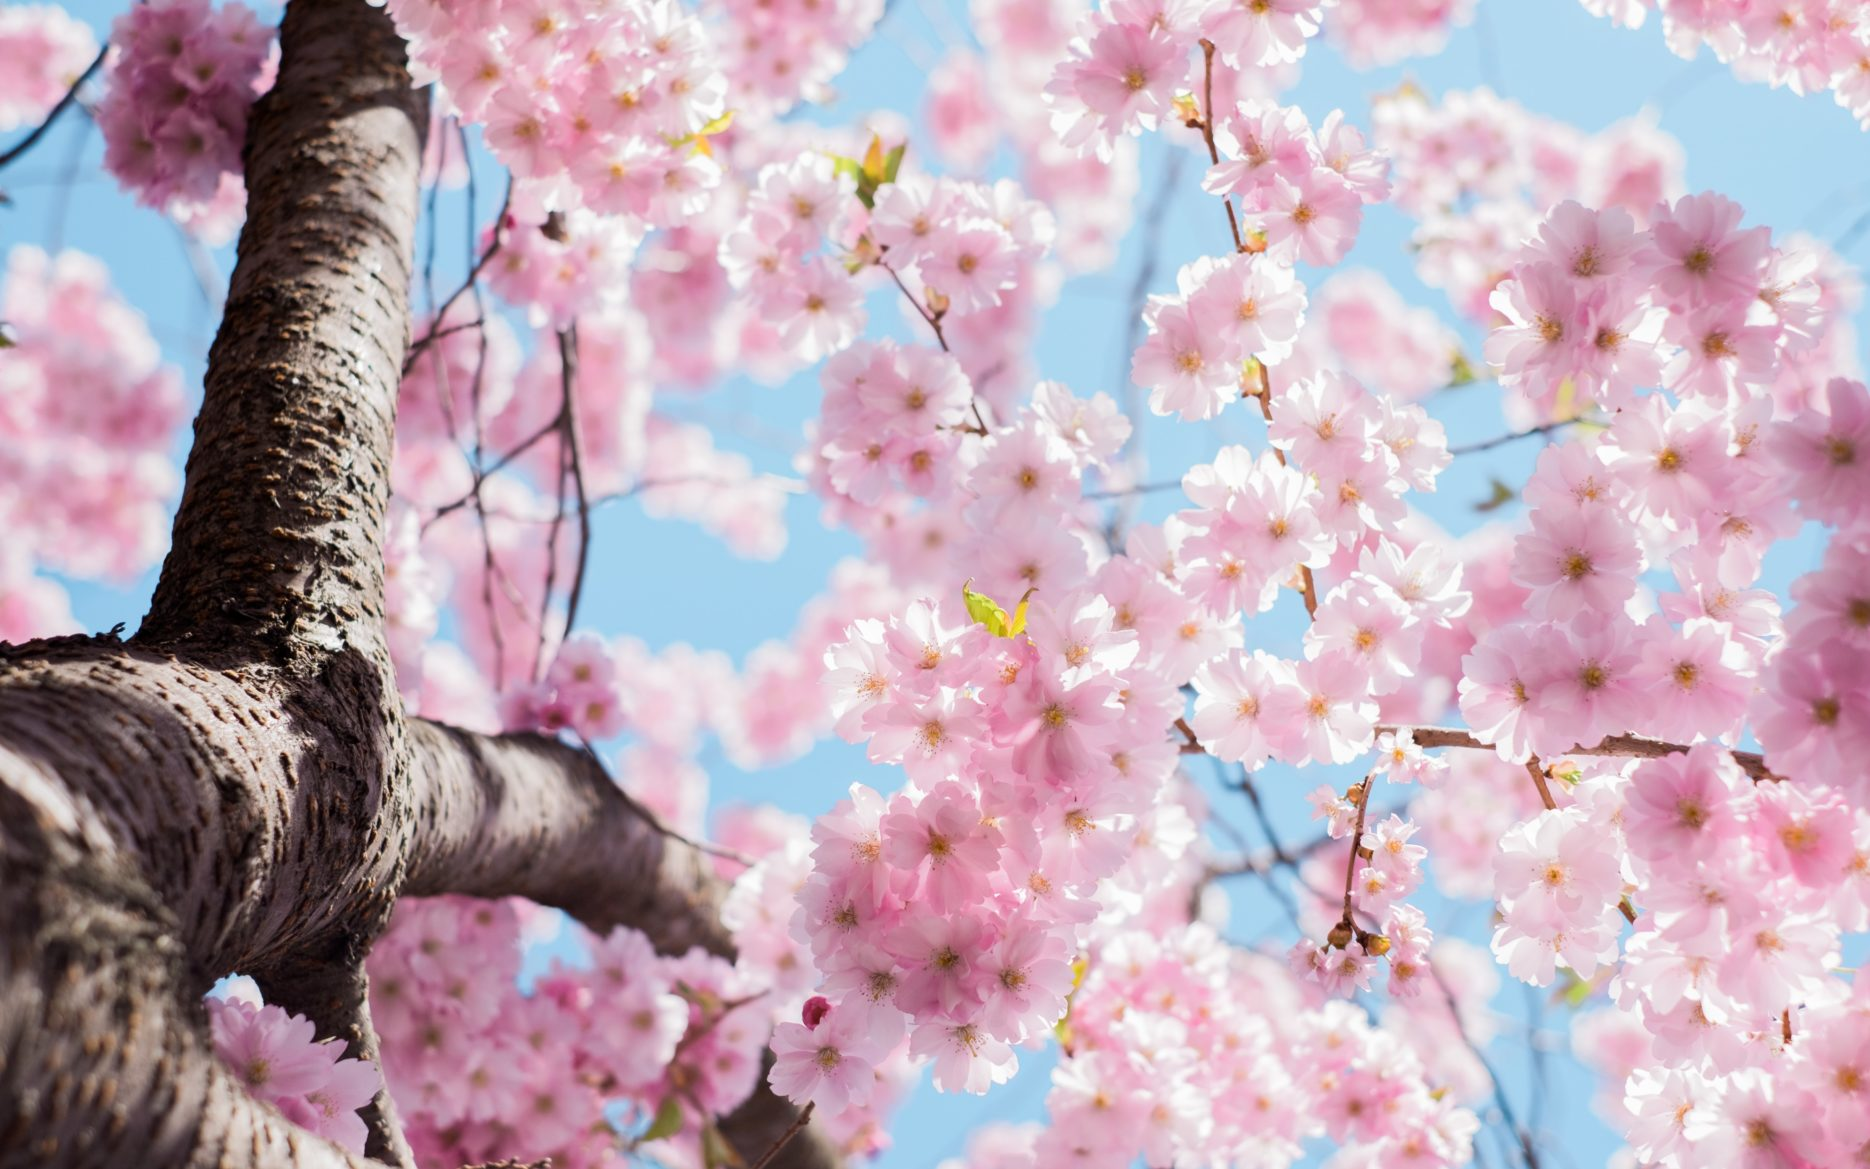 Cherry blossoms. Credit: Unsplash